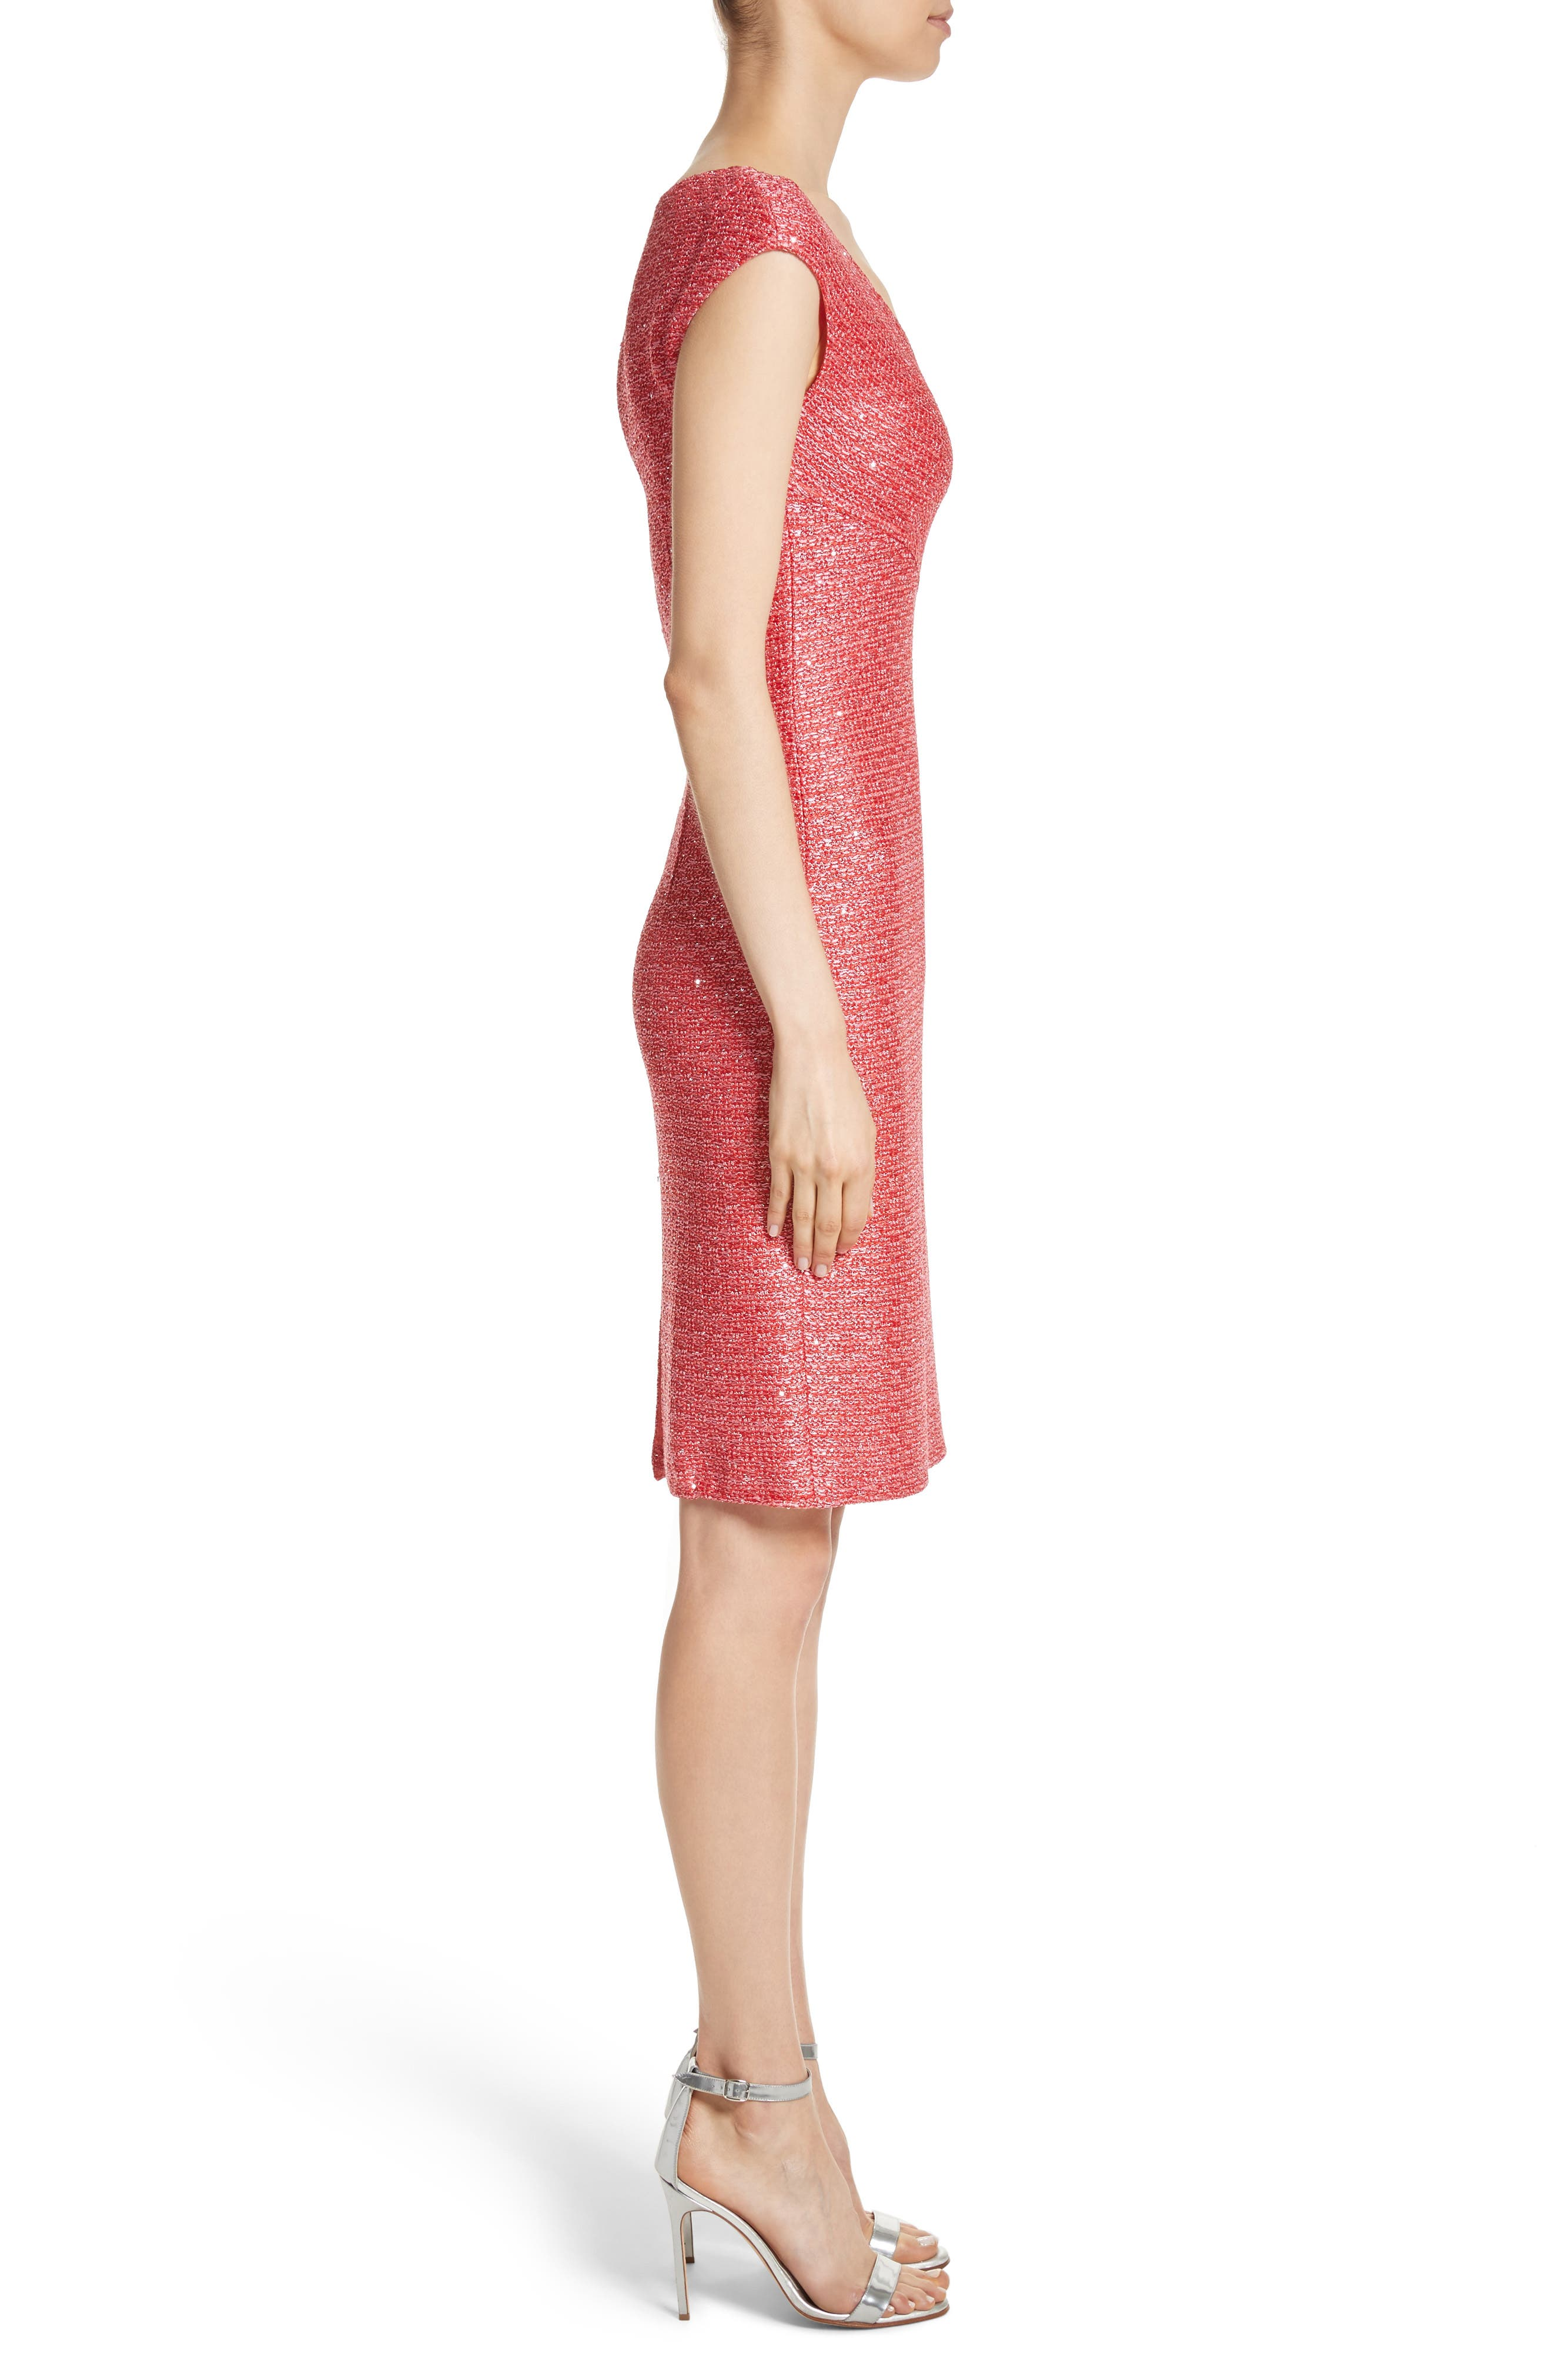 ST. JOHN COLLECTION,                             Hansh Knit Dress,                             Alternate thumbnail 3, color,                             950